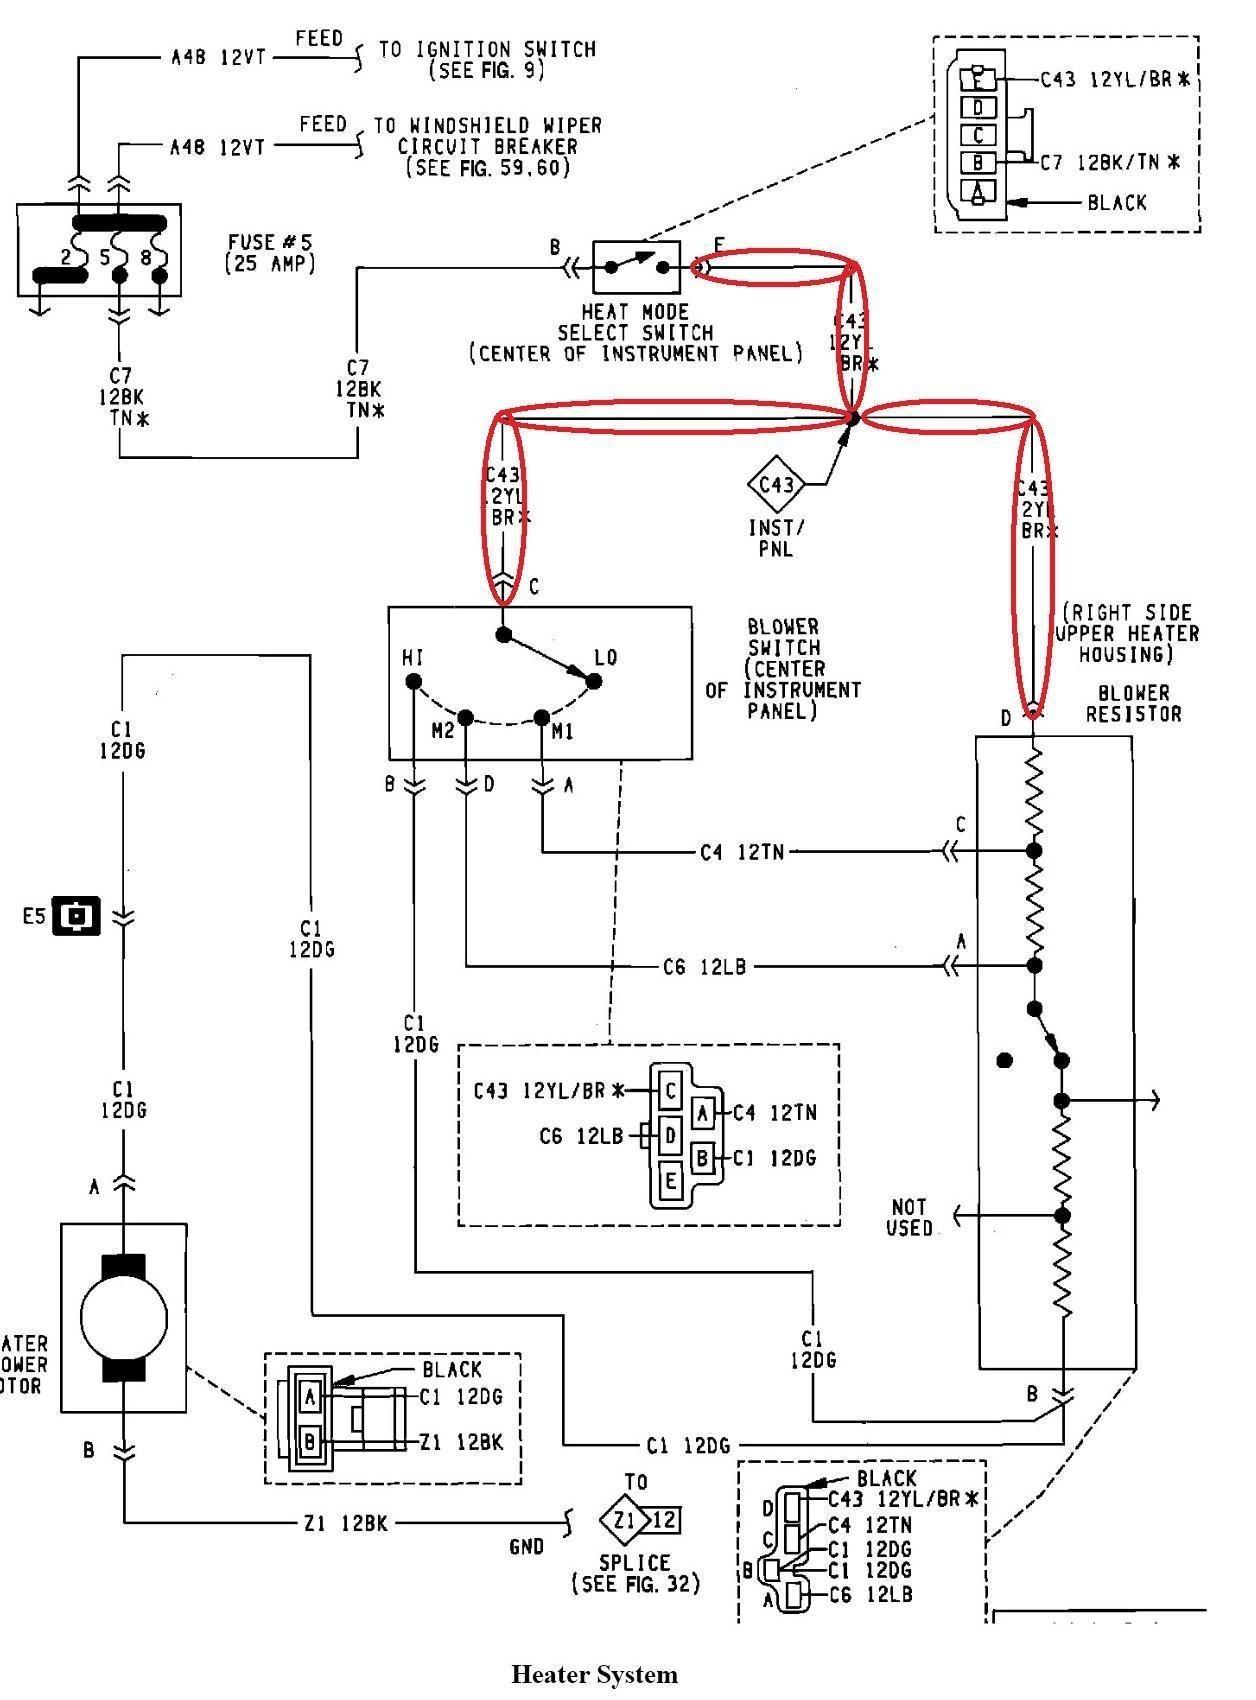 36 volt ez go golf cart wiring diagram ezgo txt 36 volt wiring diagram new battery wiring diagram for club car valid ez go 17i